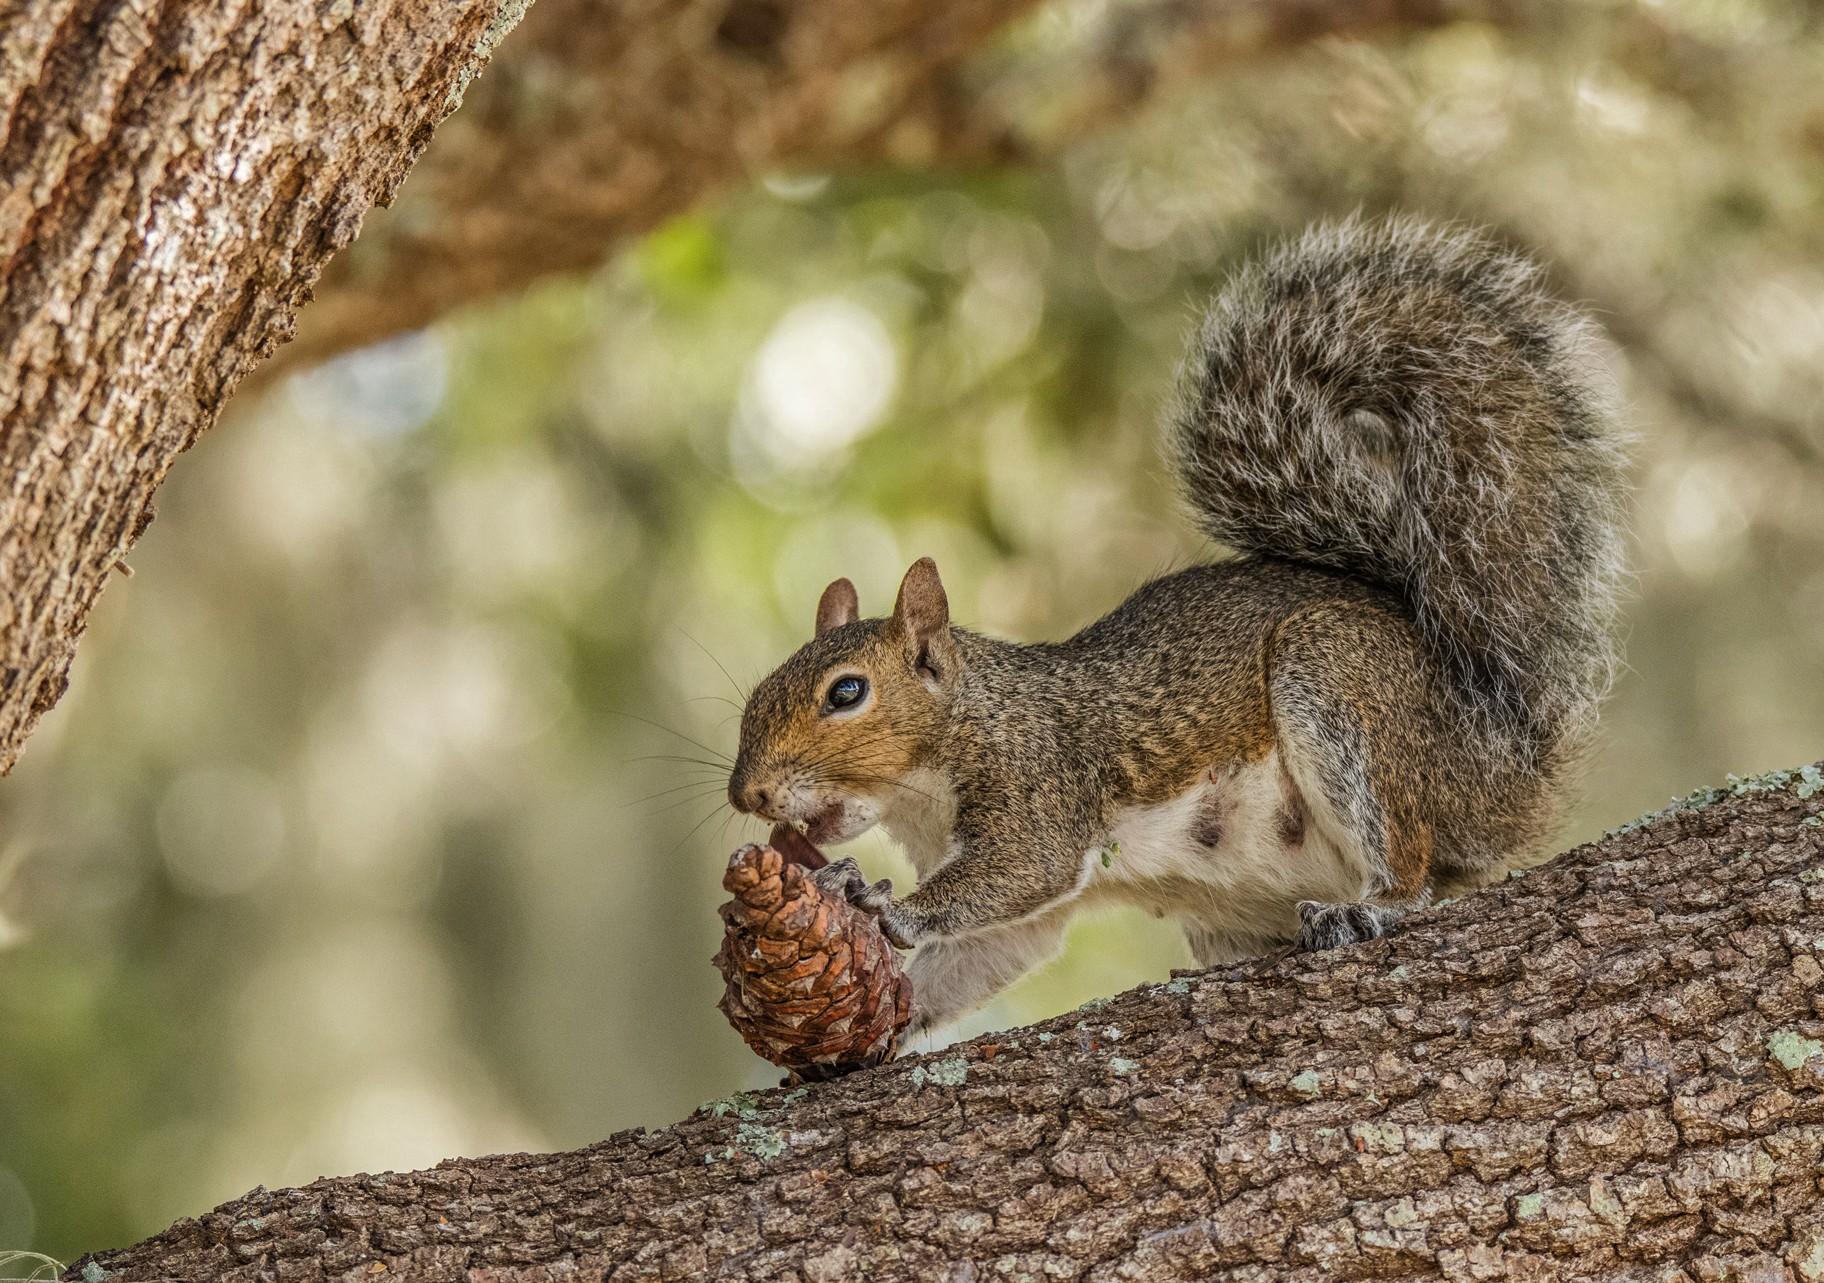 039-Squirrel-eating-pine-nuts-(2)-f.jpg